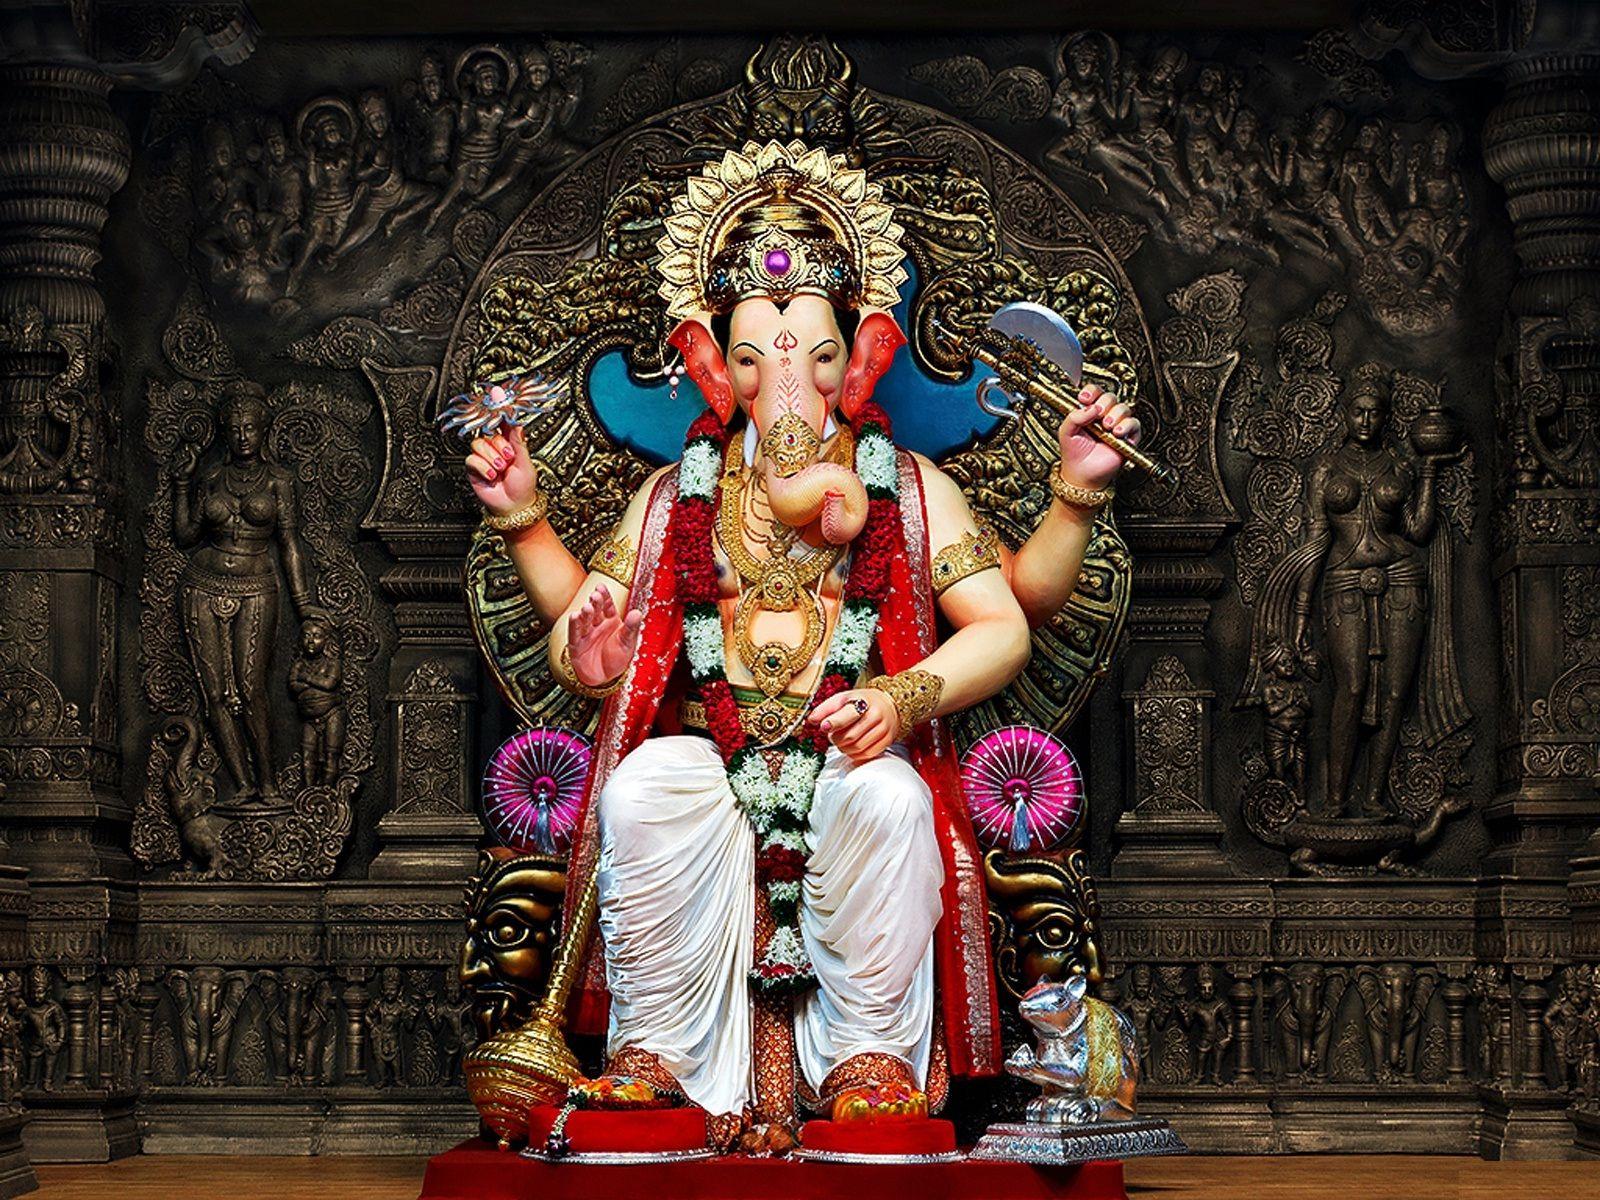 Hd wallpaper ganesh - God Ganesh Supreme Wide Hd Wallpaper Hd Wallpapers Rocks